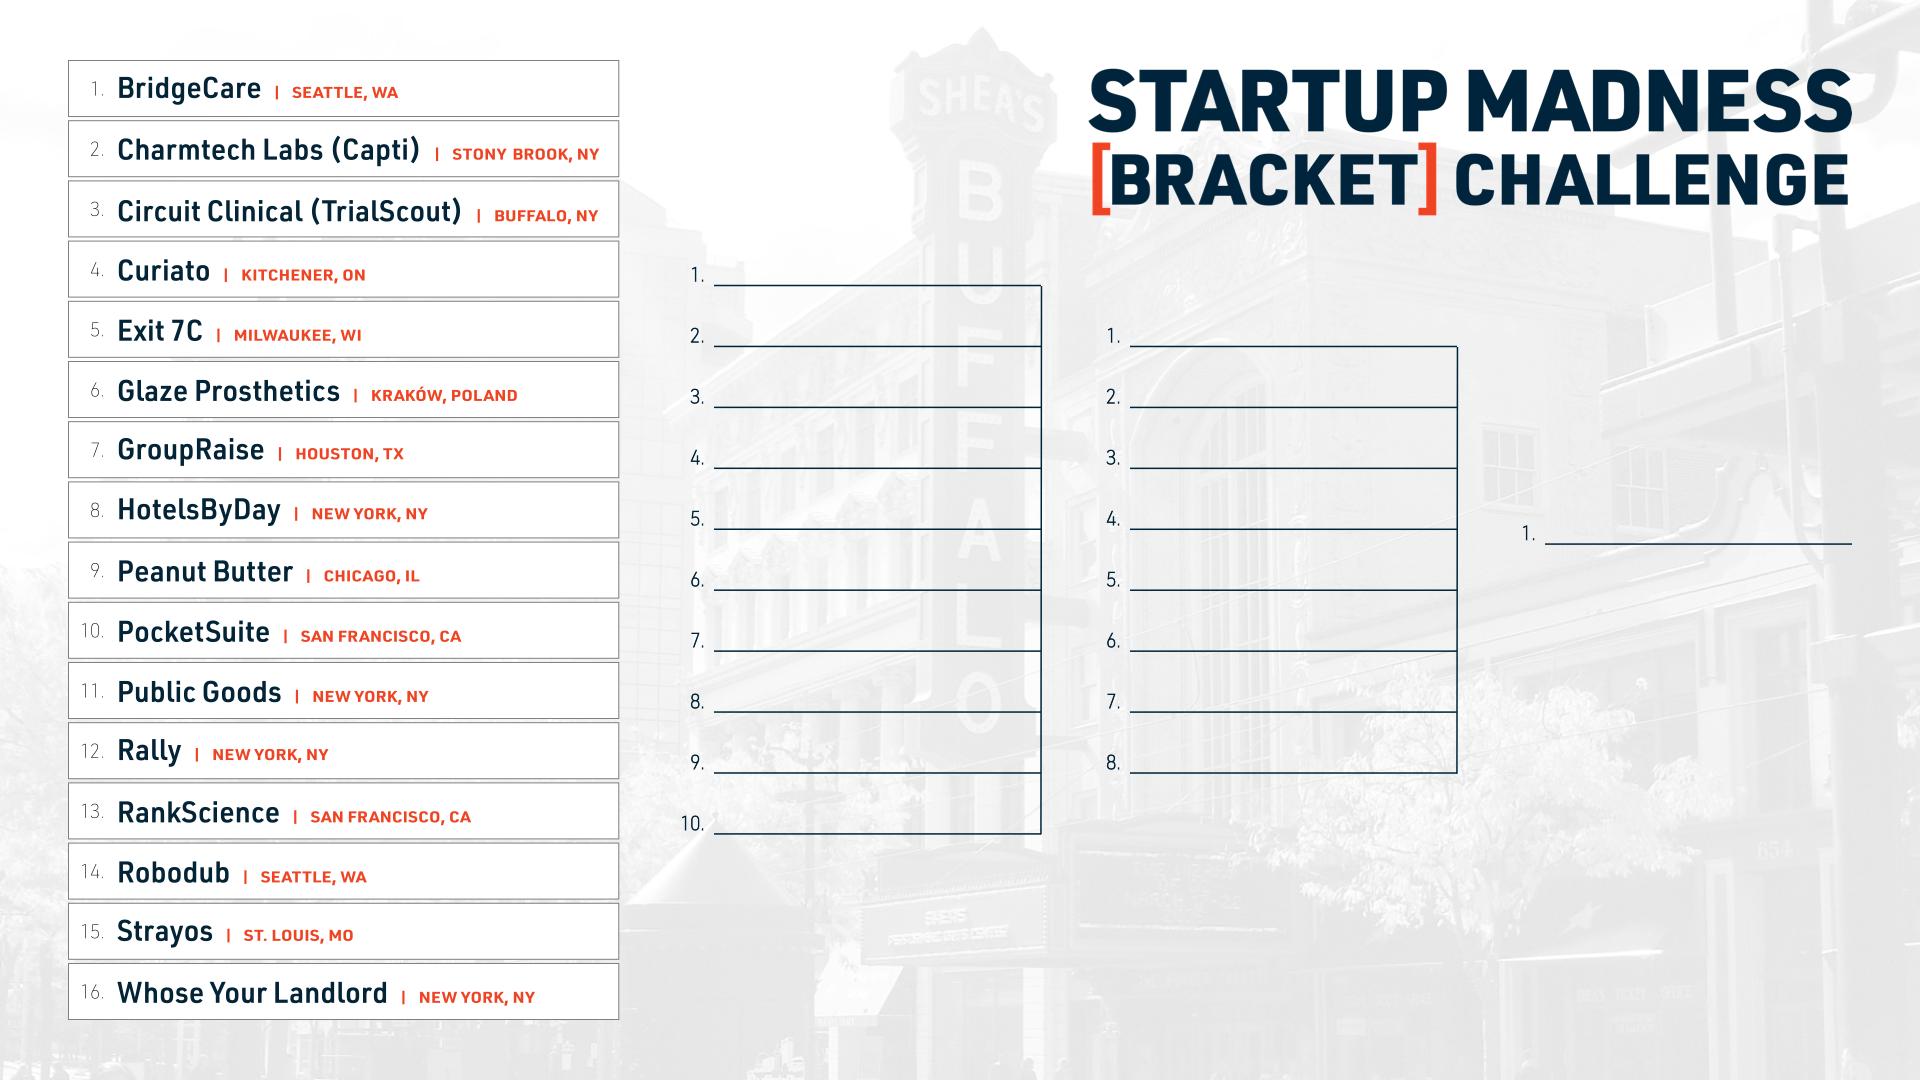 Startup Madness Bracket Challenge